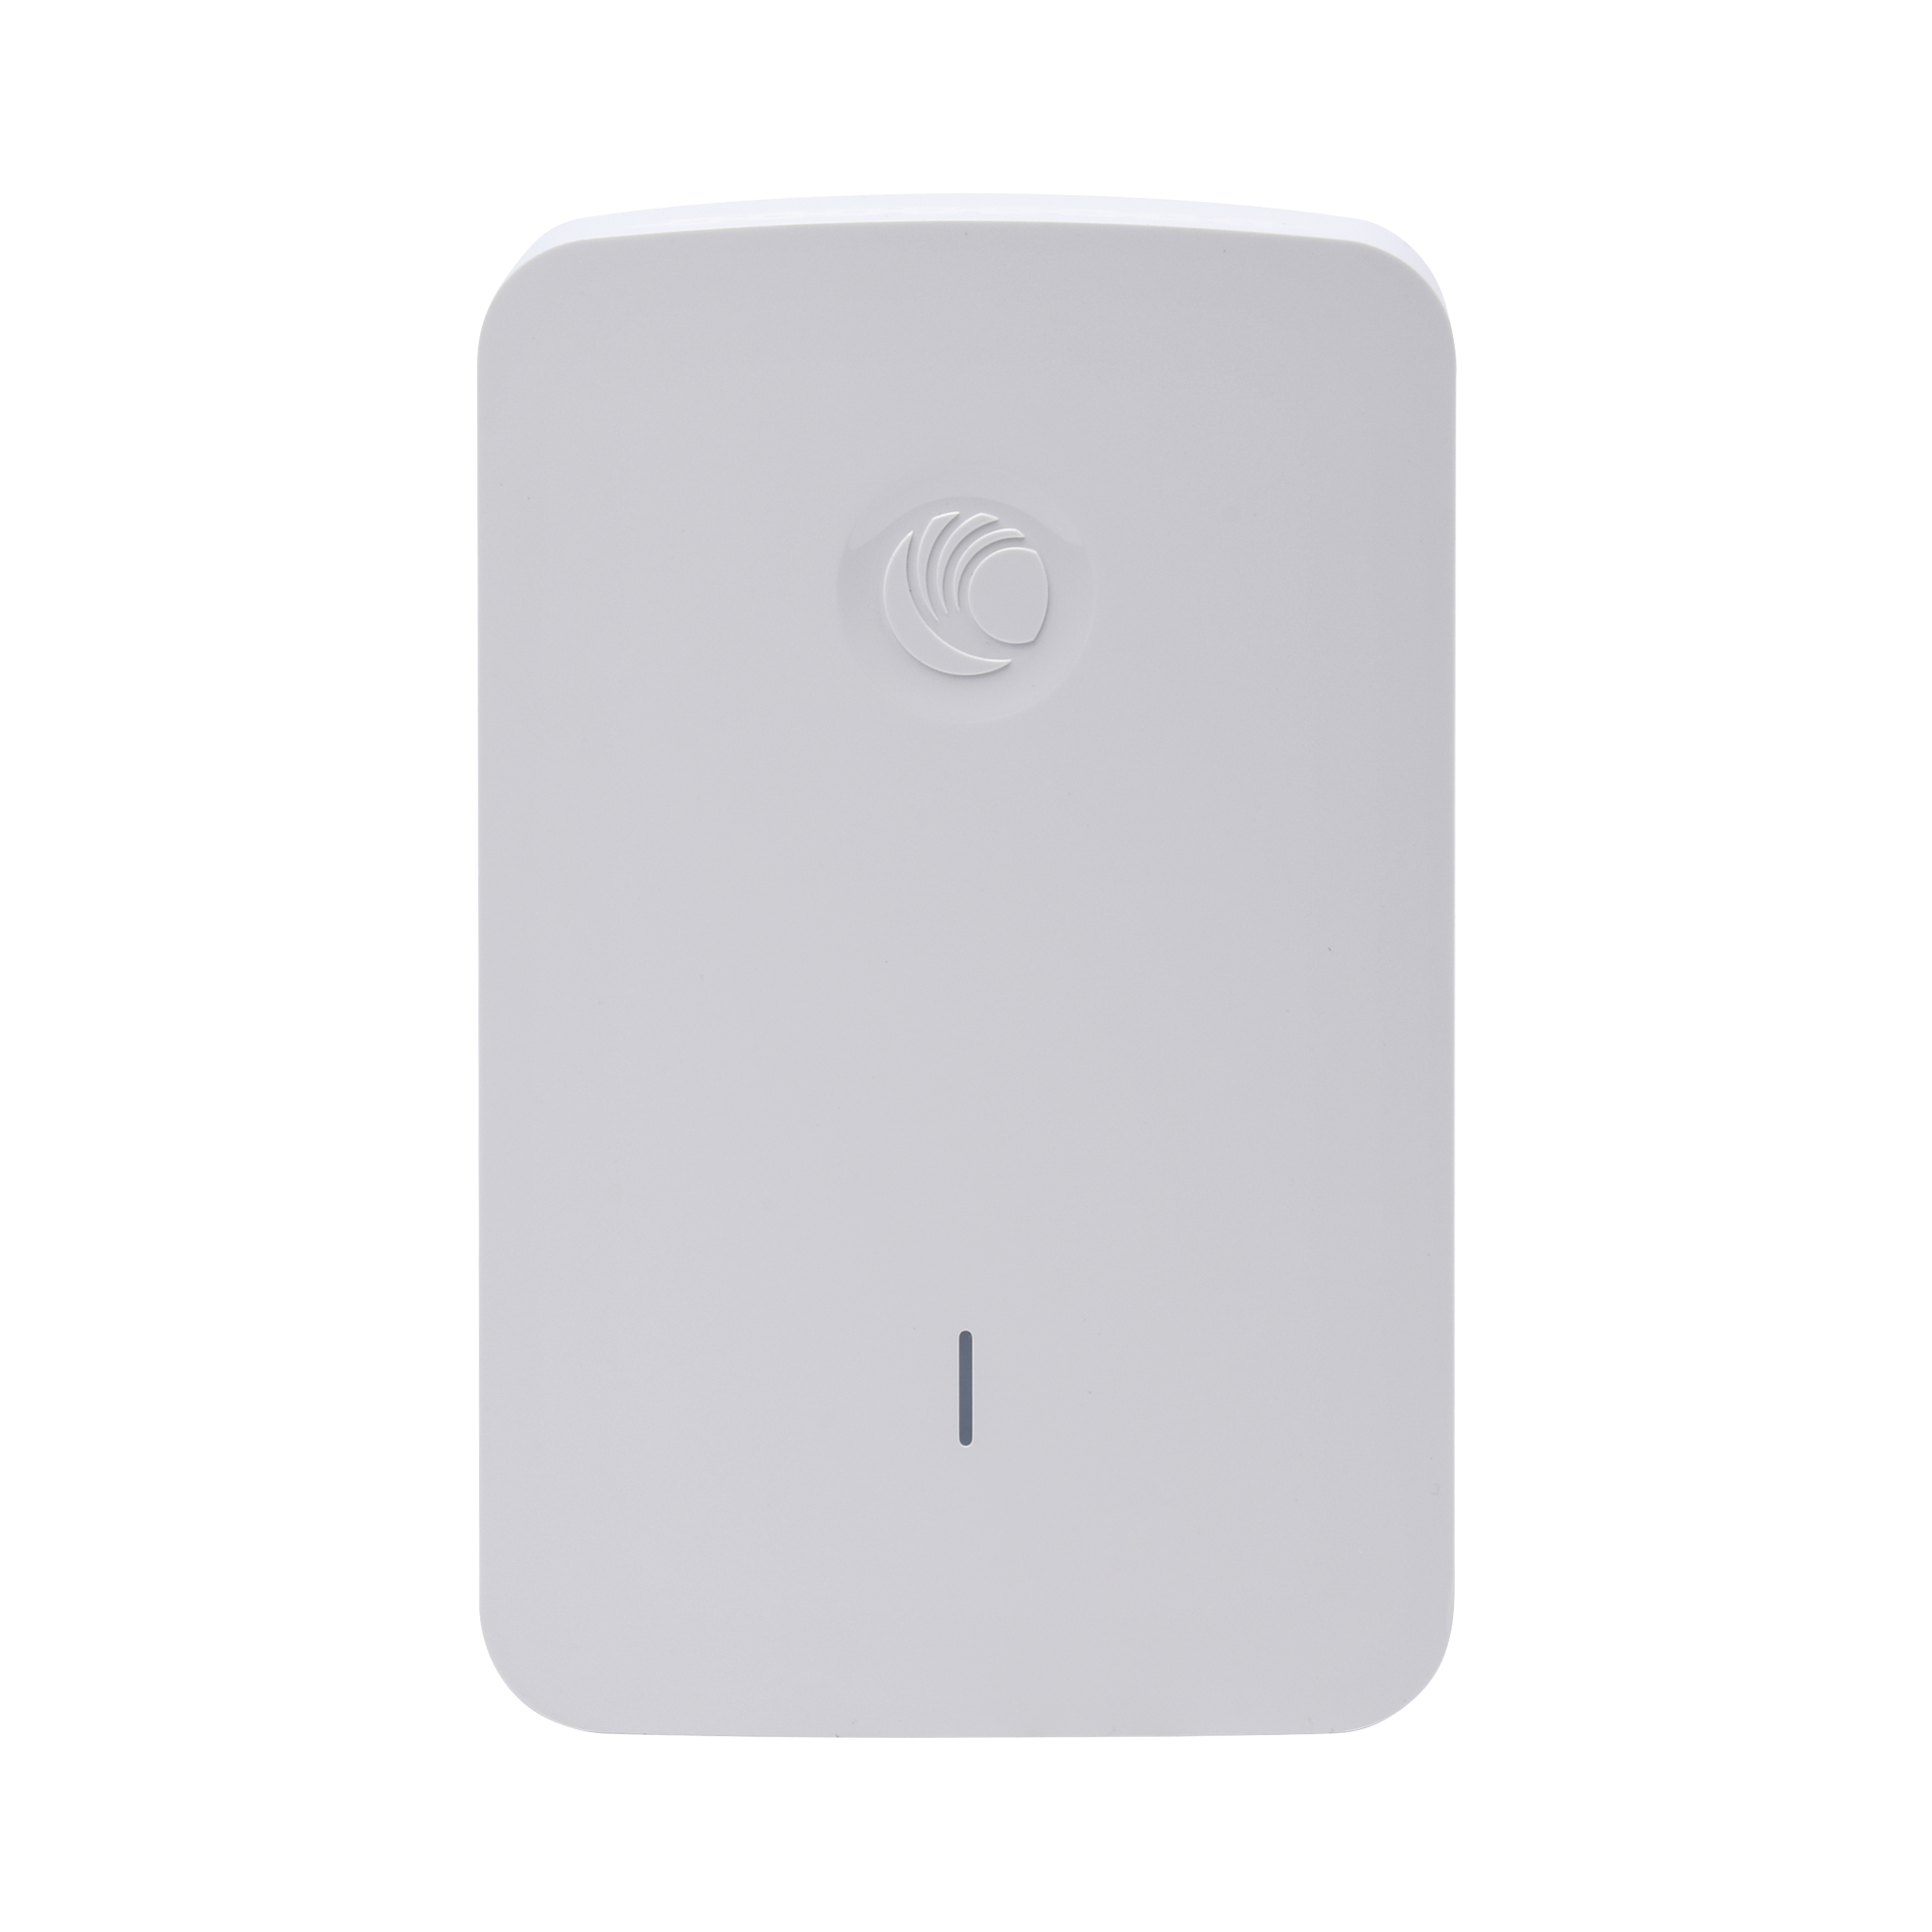 Access Point WiFi cnPilot e430H Indoor Wall Plate, doble banda, Wave 2, antena beamforming, 4 puertos de salida (1x PoE Gigabit y 3x Ethernet Gigabit)